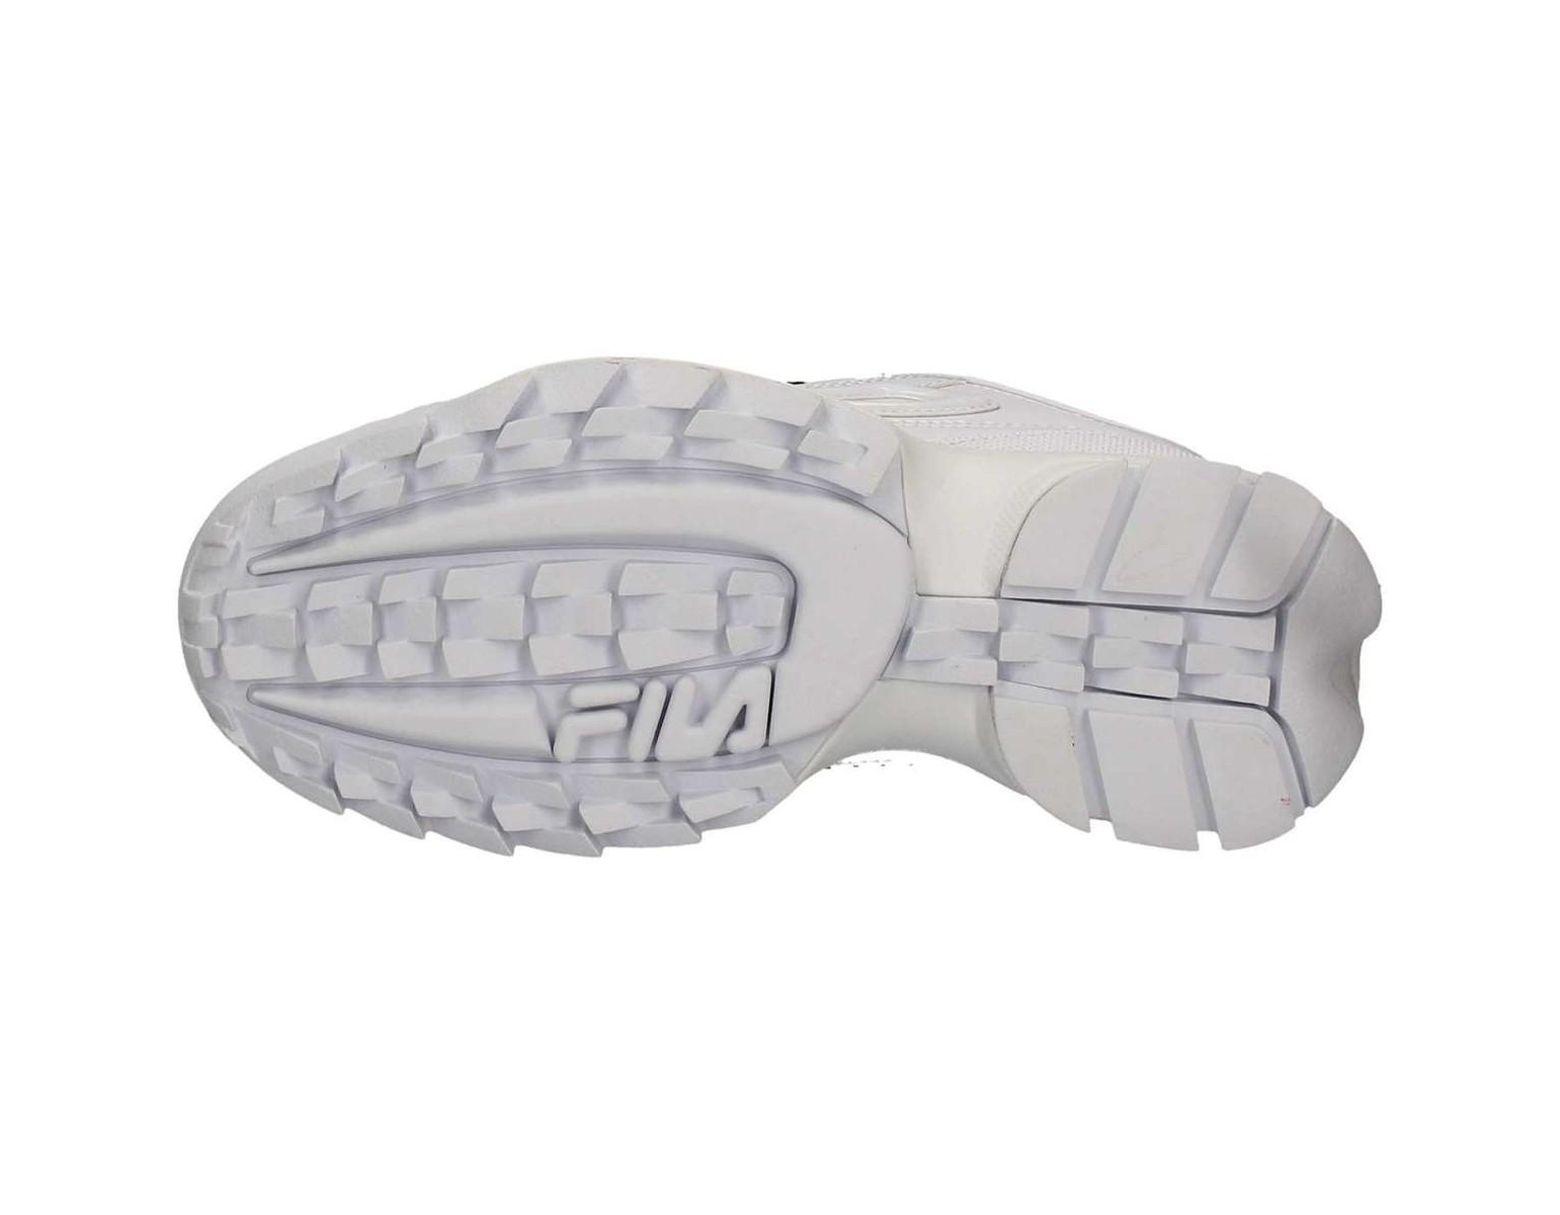 1010608 Chaussures Blanc Femmes En Lyst Coloris Fila 1fg OXTZkiuP